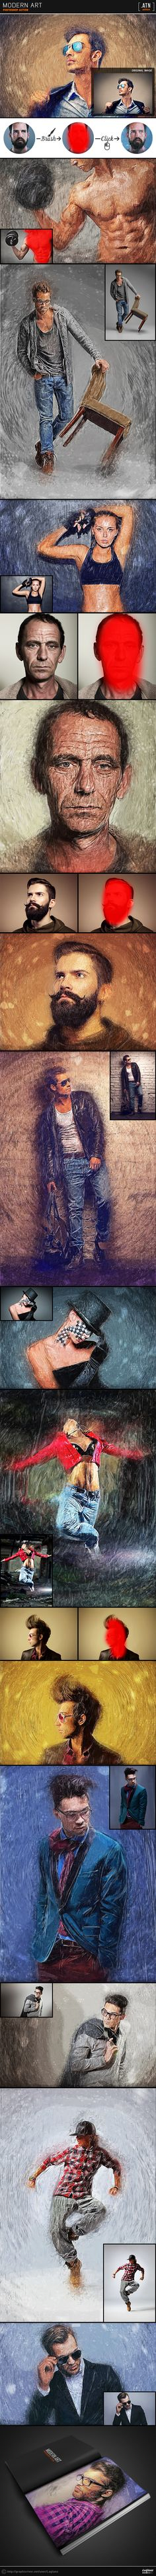 Modern Art - Painting Effect Photoshop #photoeffect Download: http://graphicriver.net/item/modern-art-painting-effect/14071490?ref=ksioks